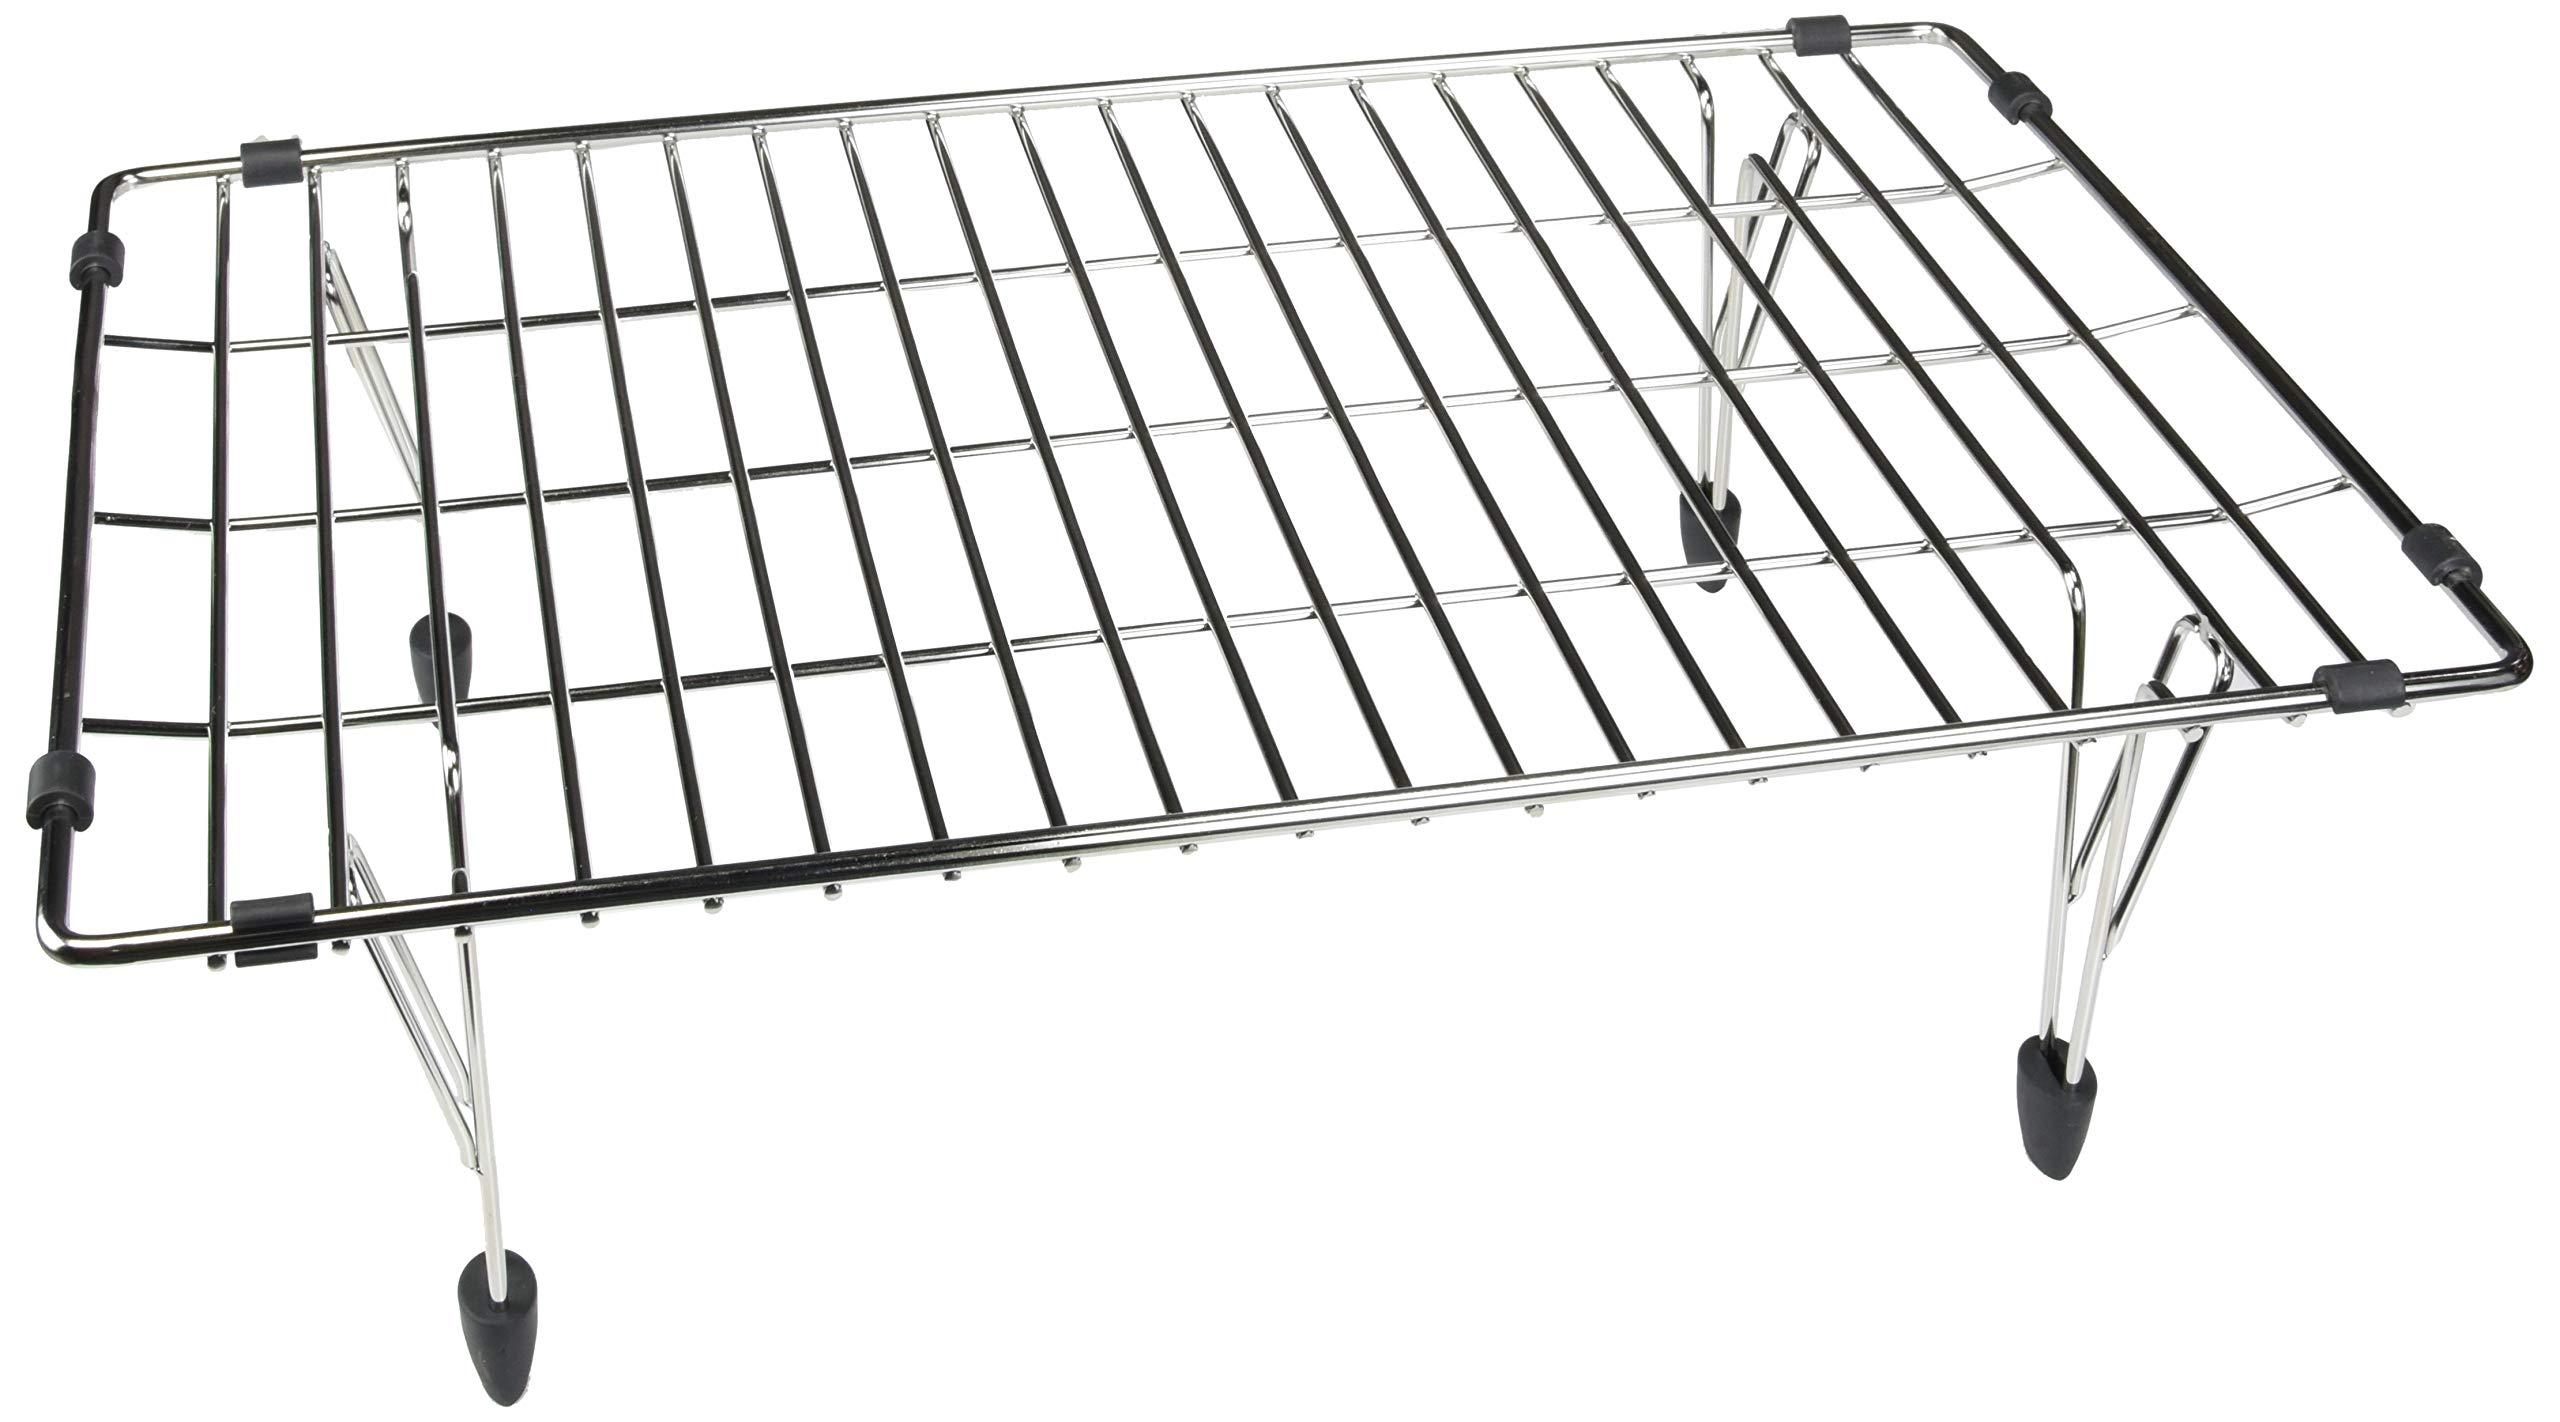 Blanco 231608 Multi-Level Sink Grid, Stainless Steel